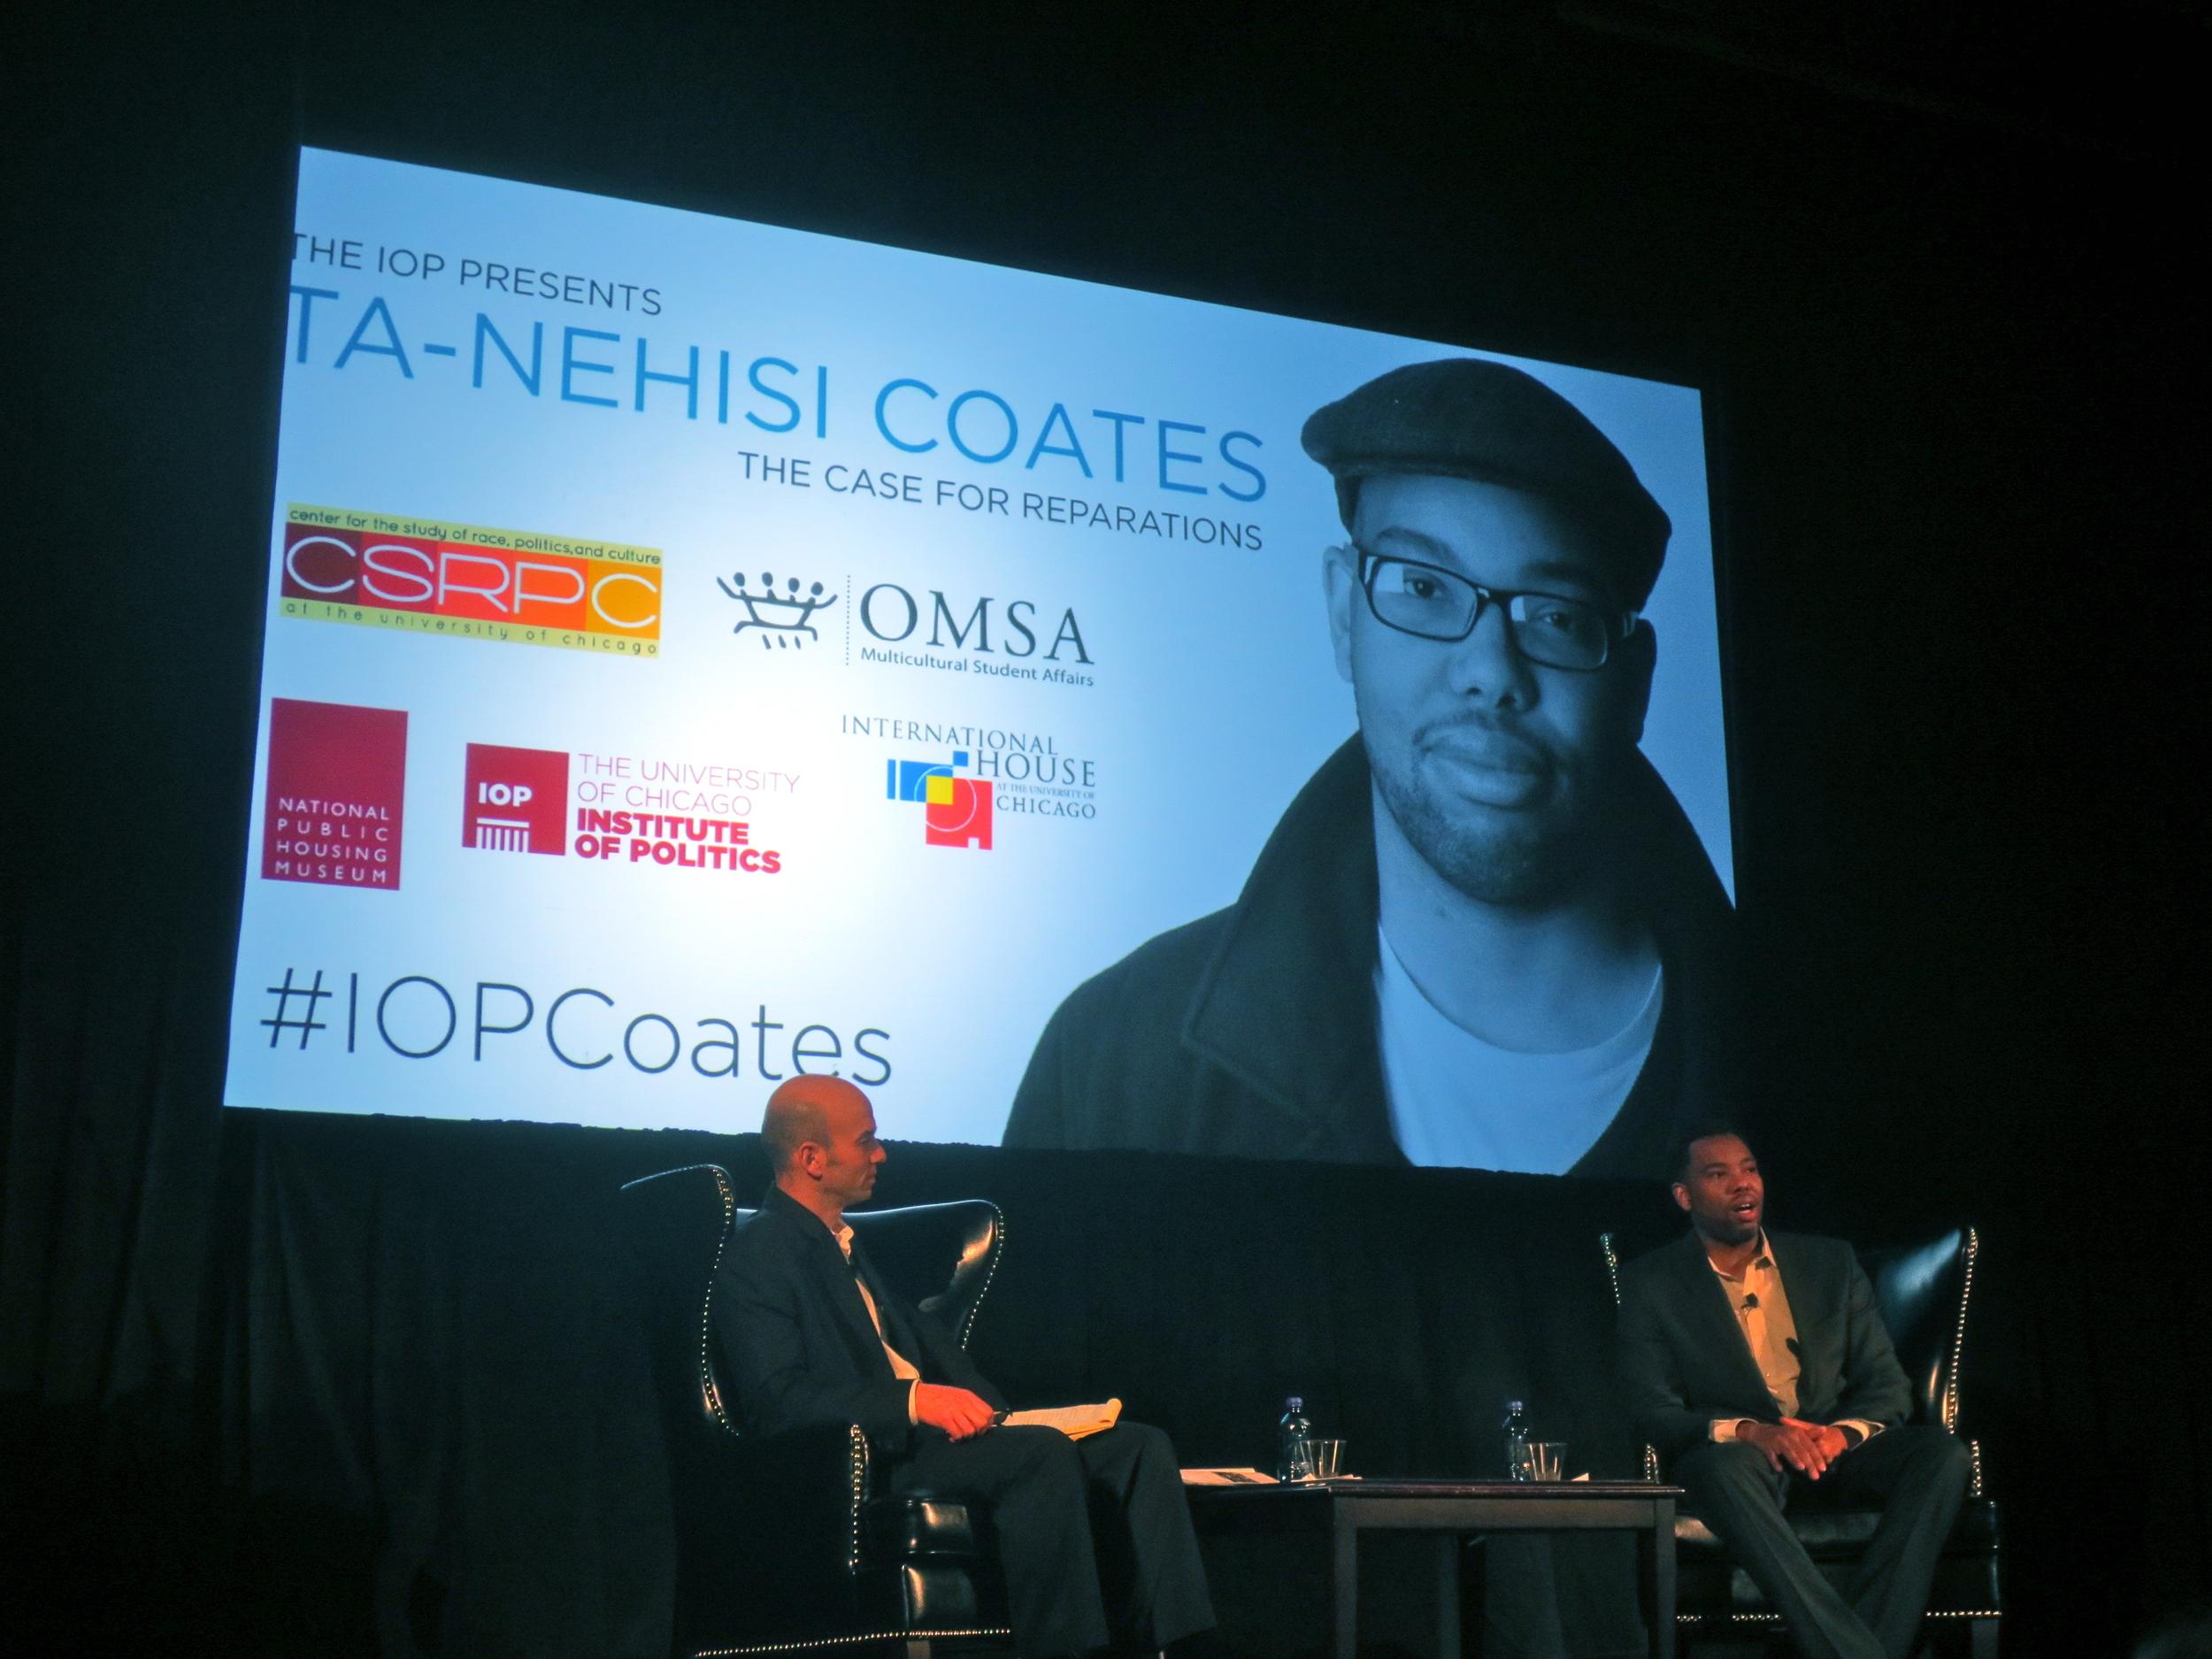 Ta-Nehisi Coates event at the University of Chicago. Photo: Daniel Ronan